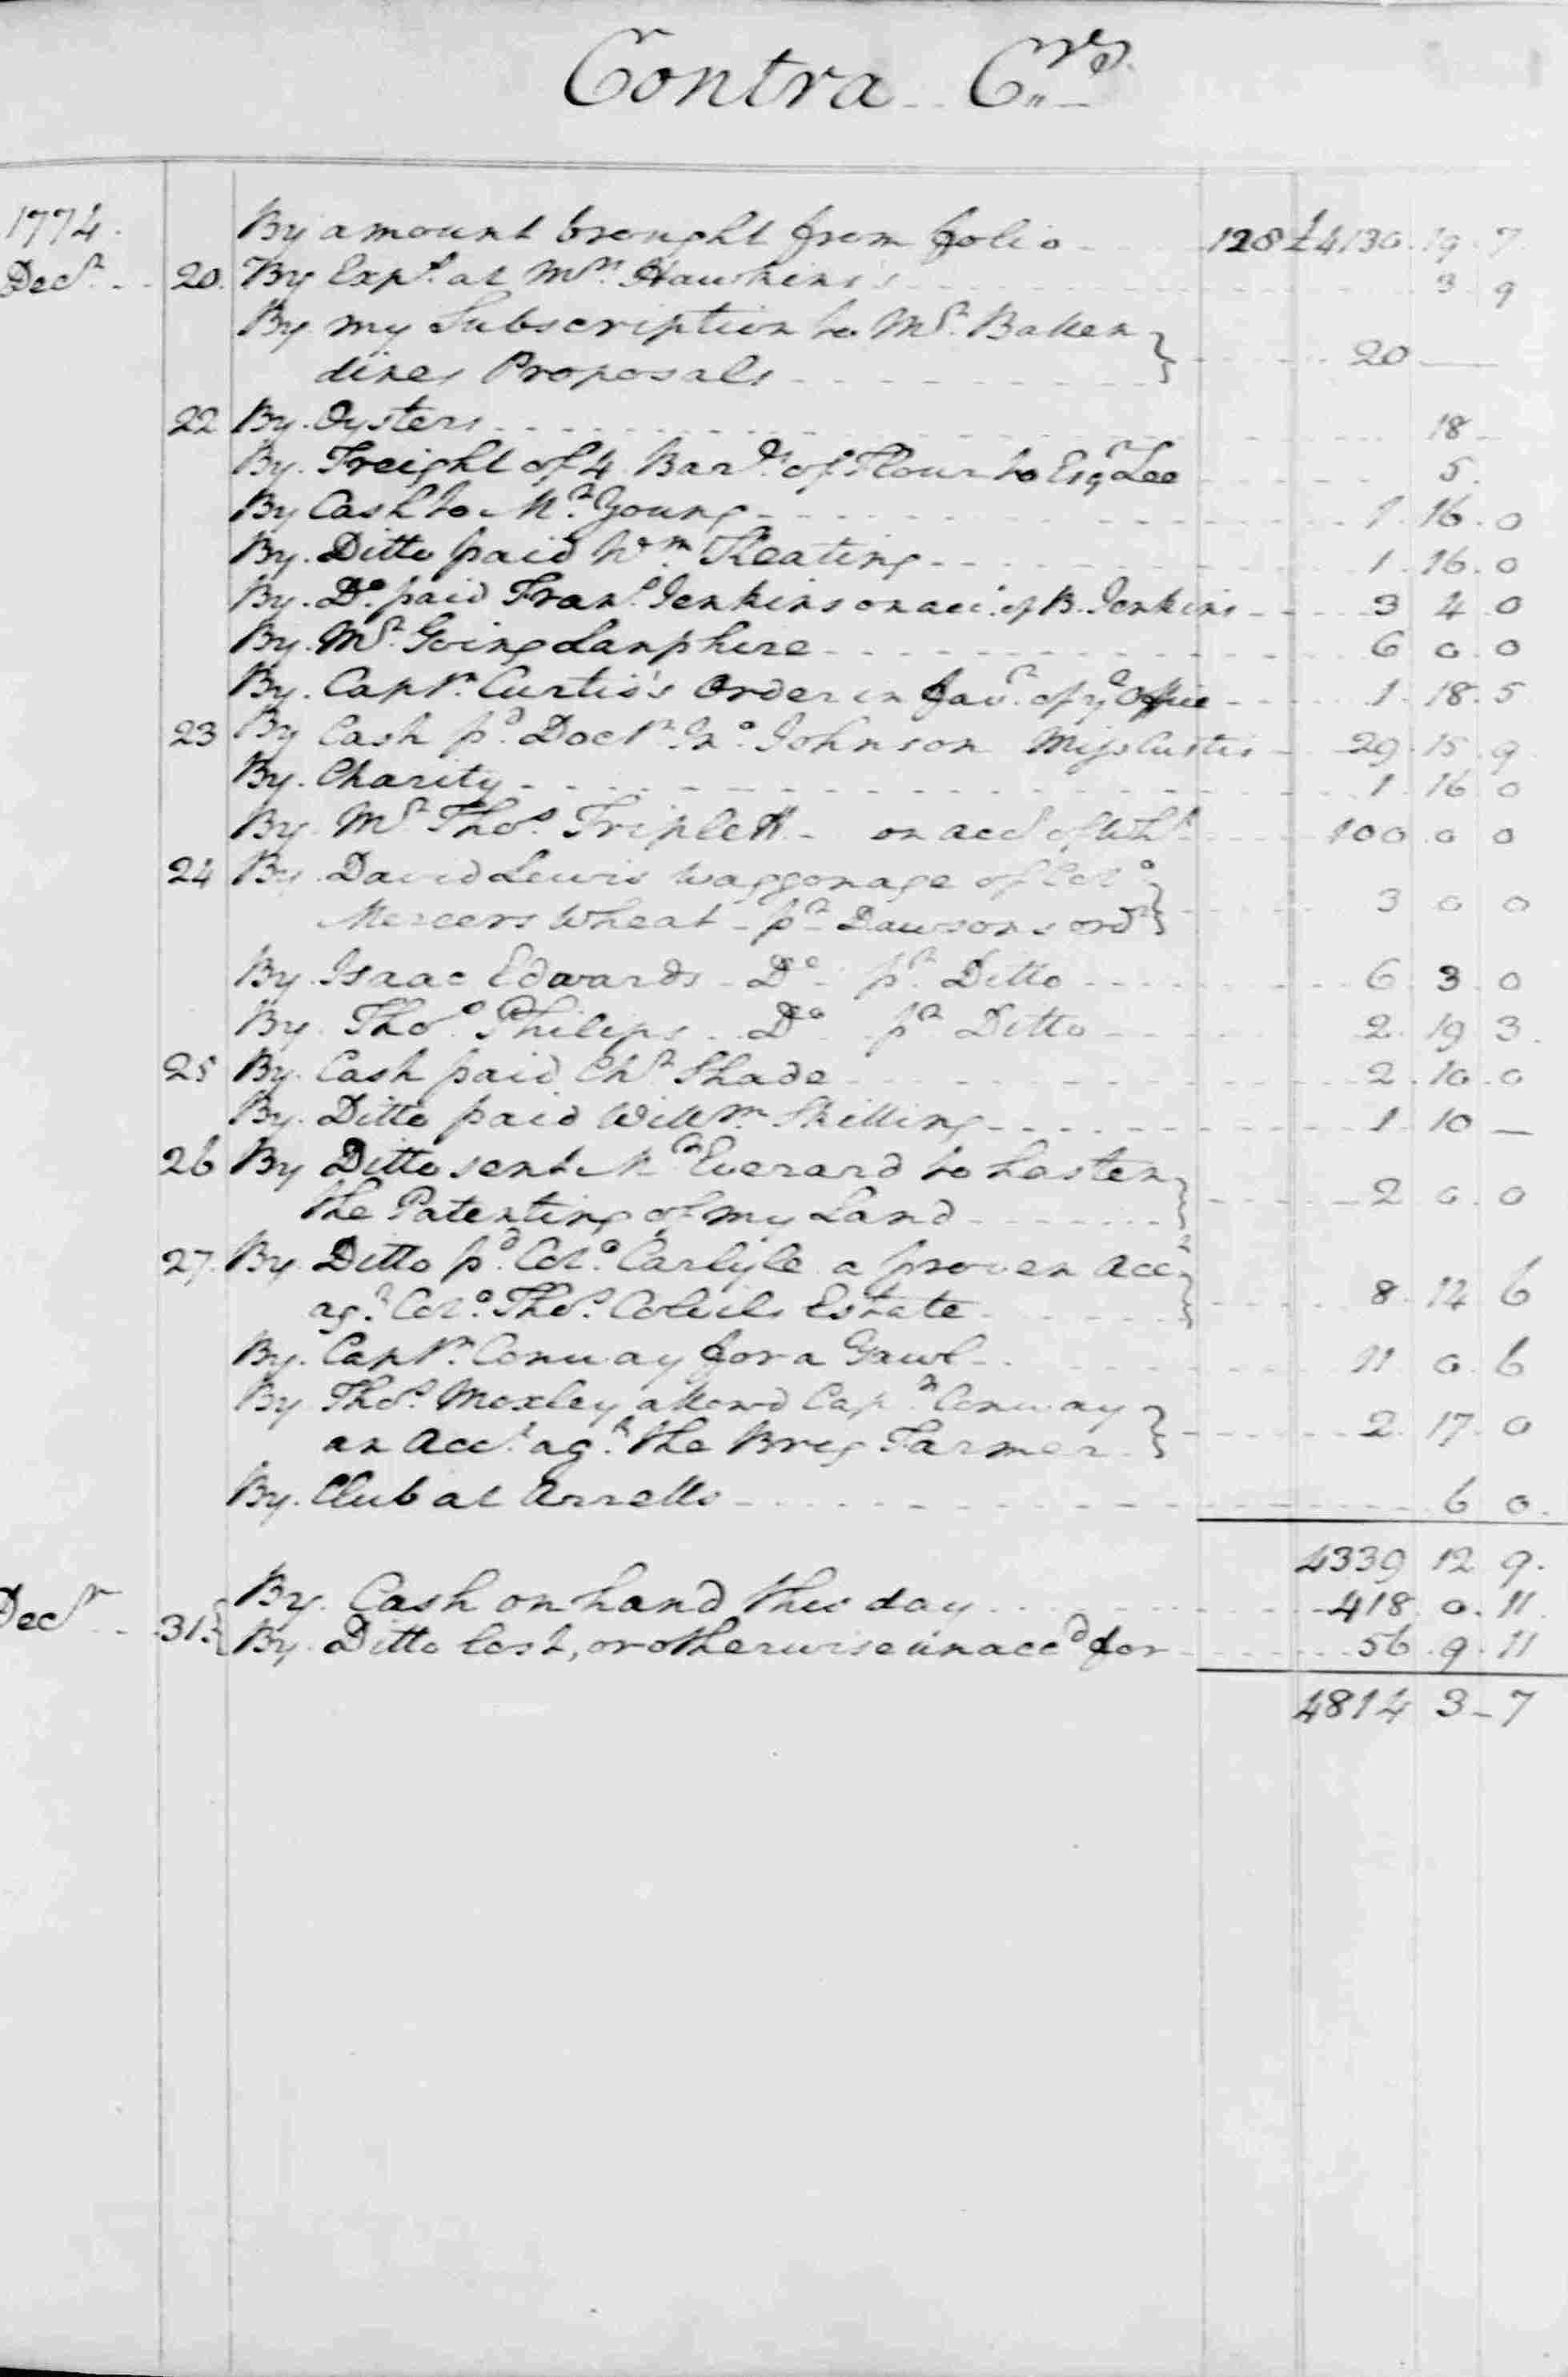 Ledger B, folio 130, right side